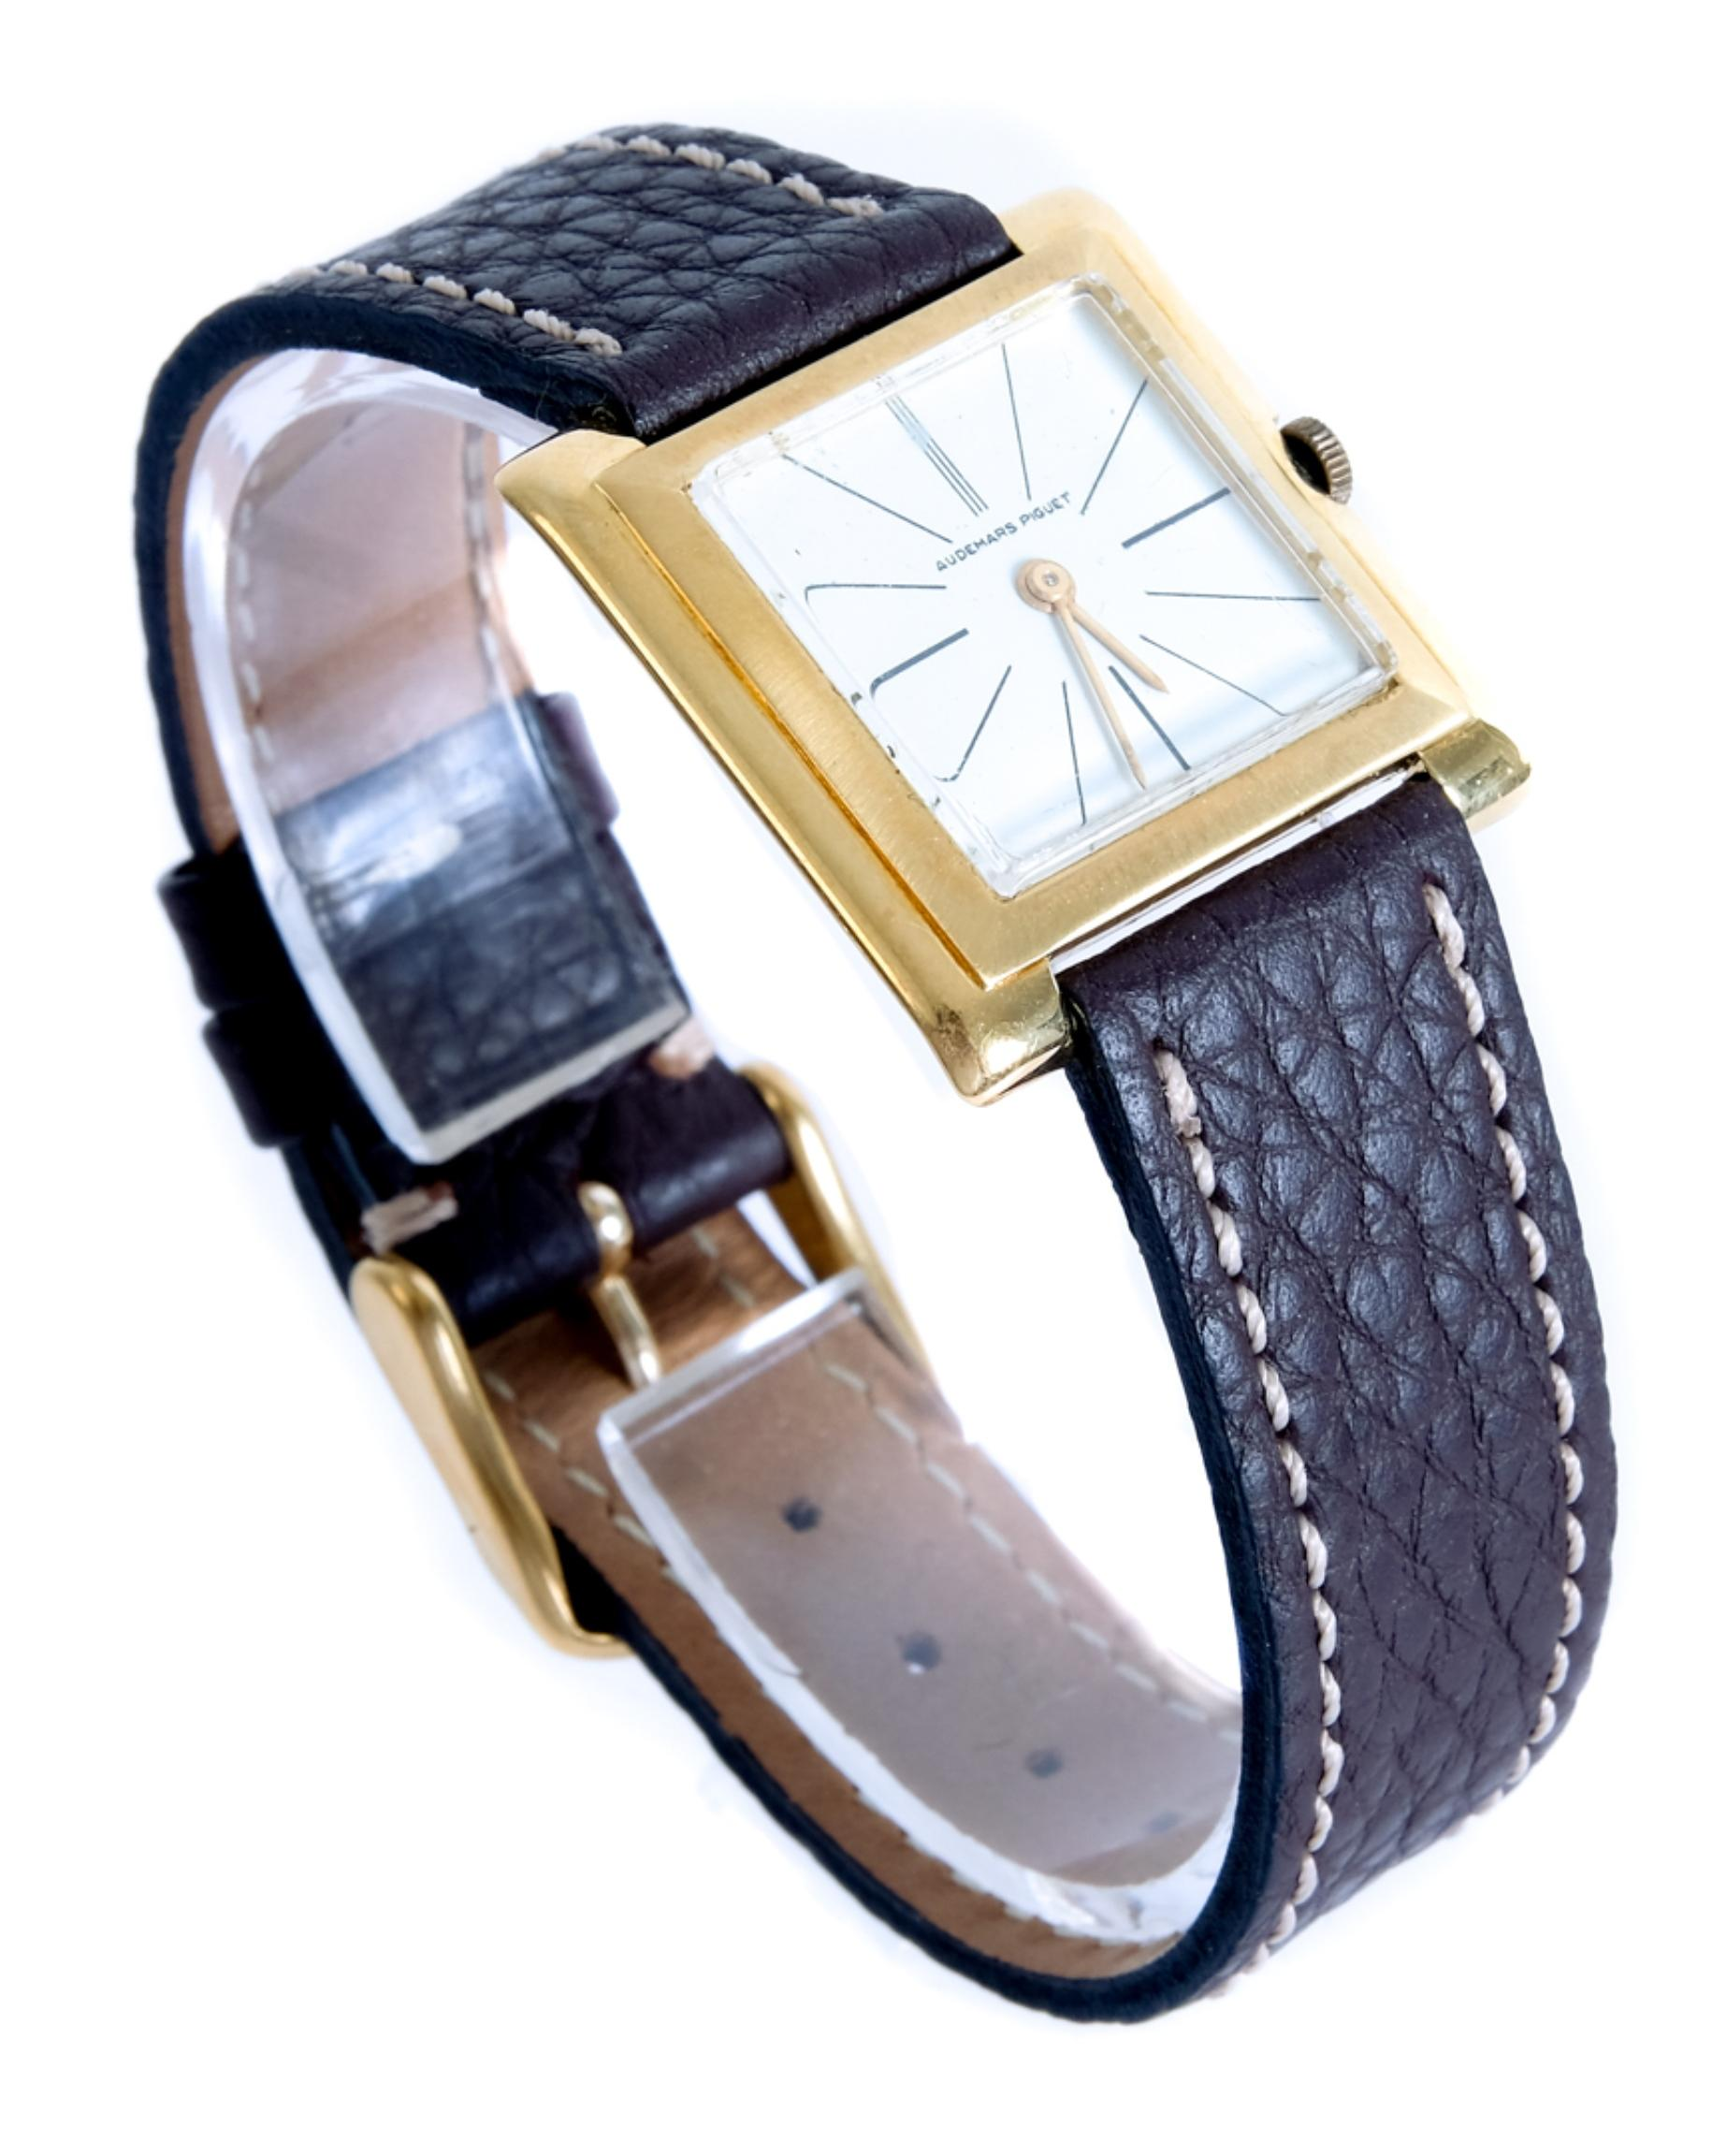 Vintage Audemars Piguet 18k YG Square Watch